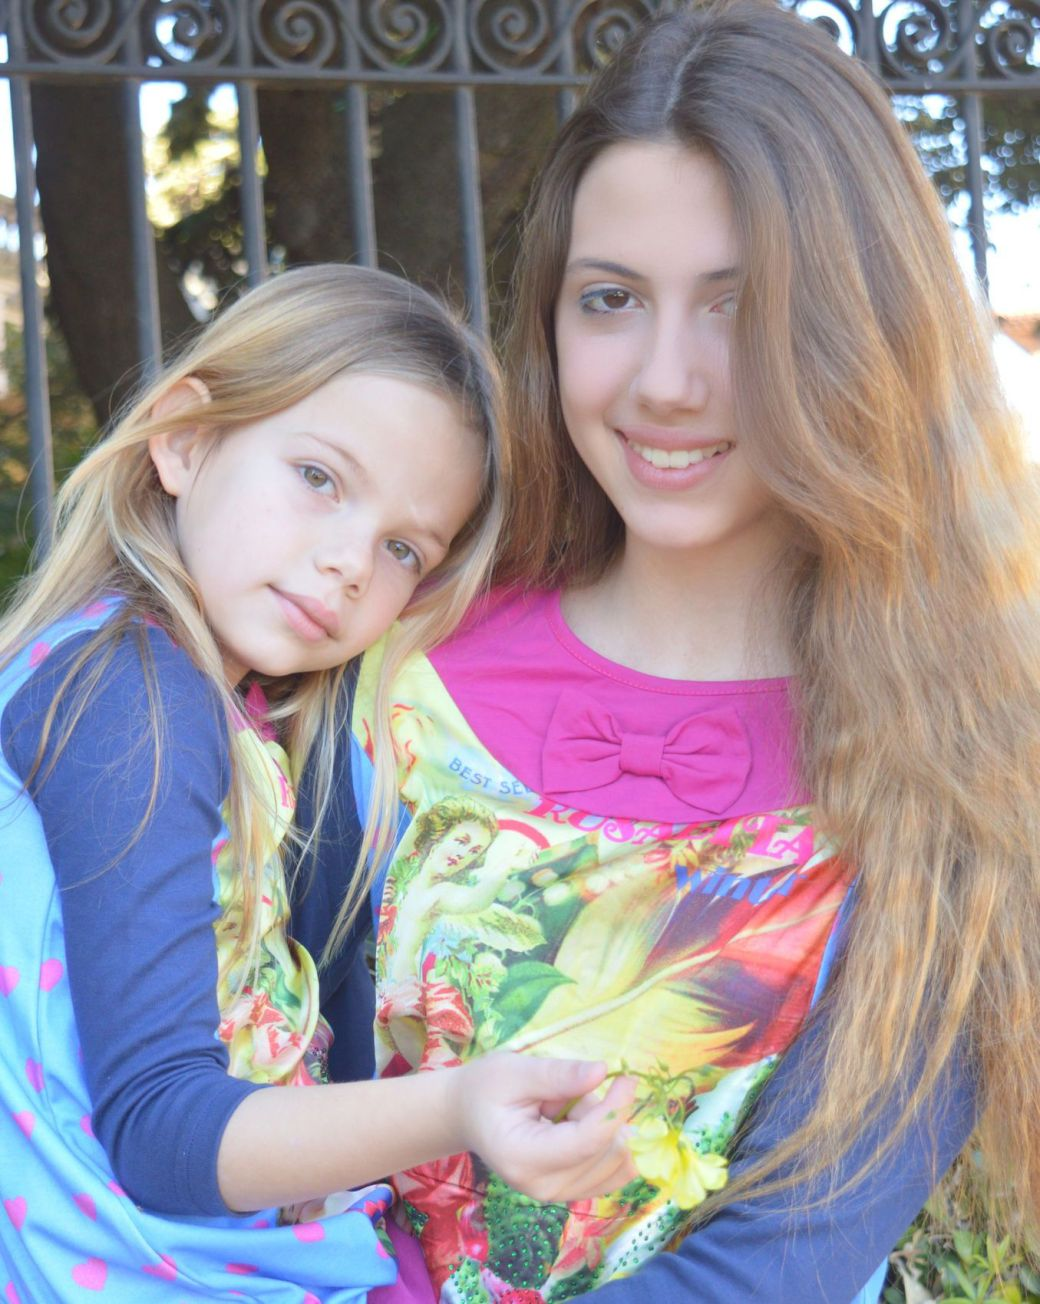 rosalita señoritas moda infantil y juvenil 9